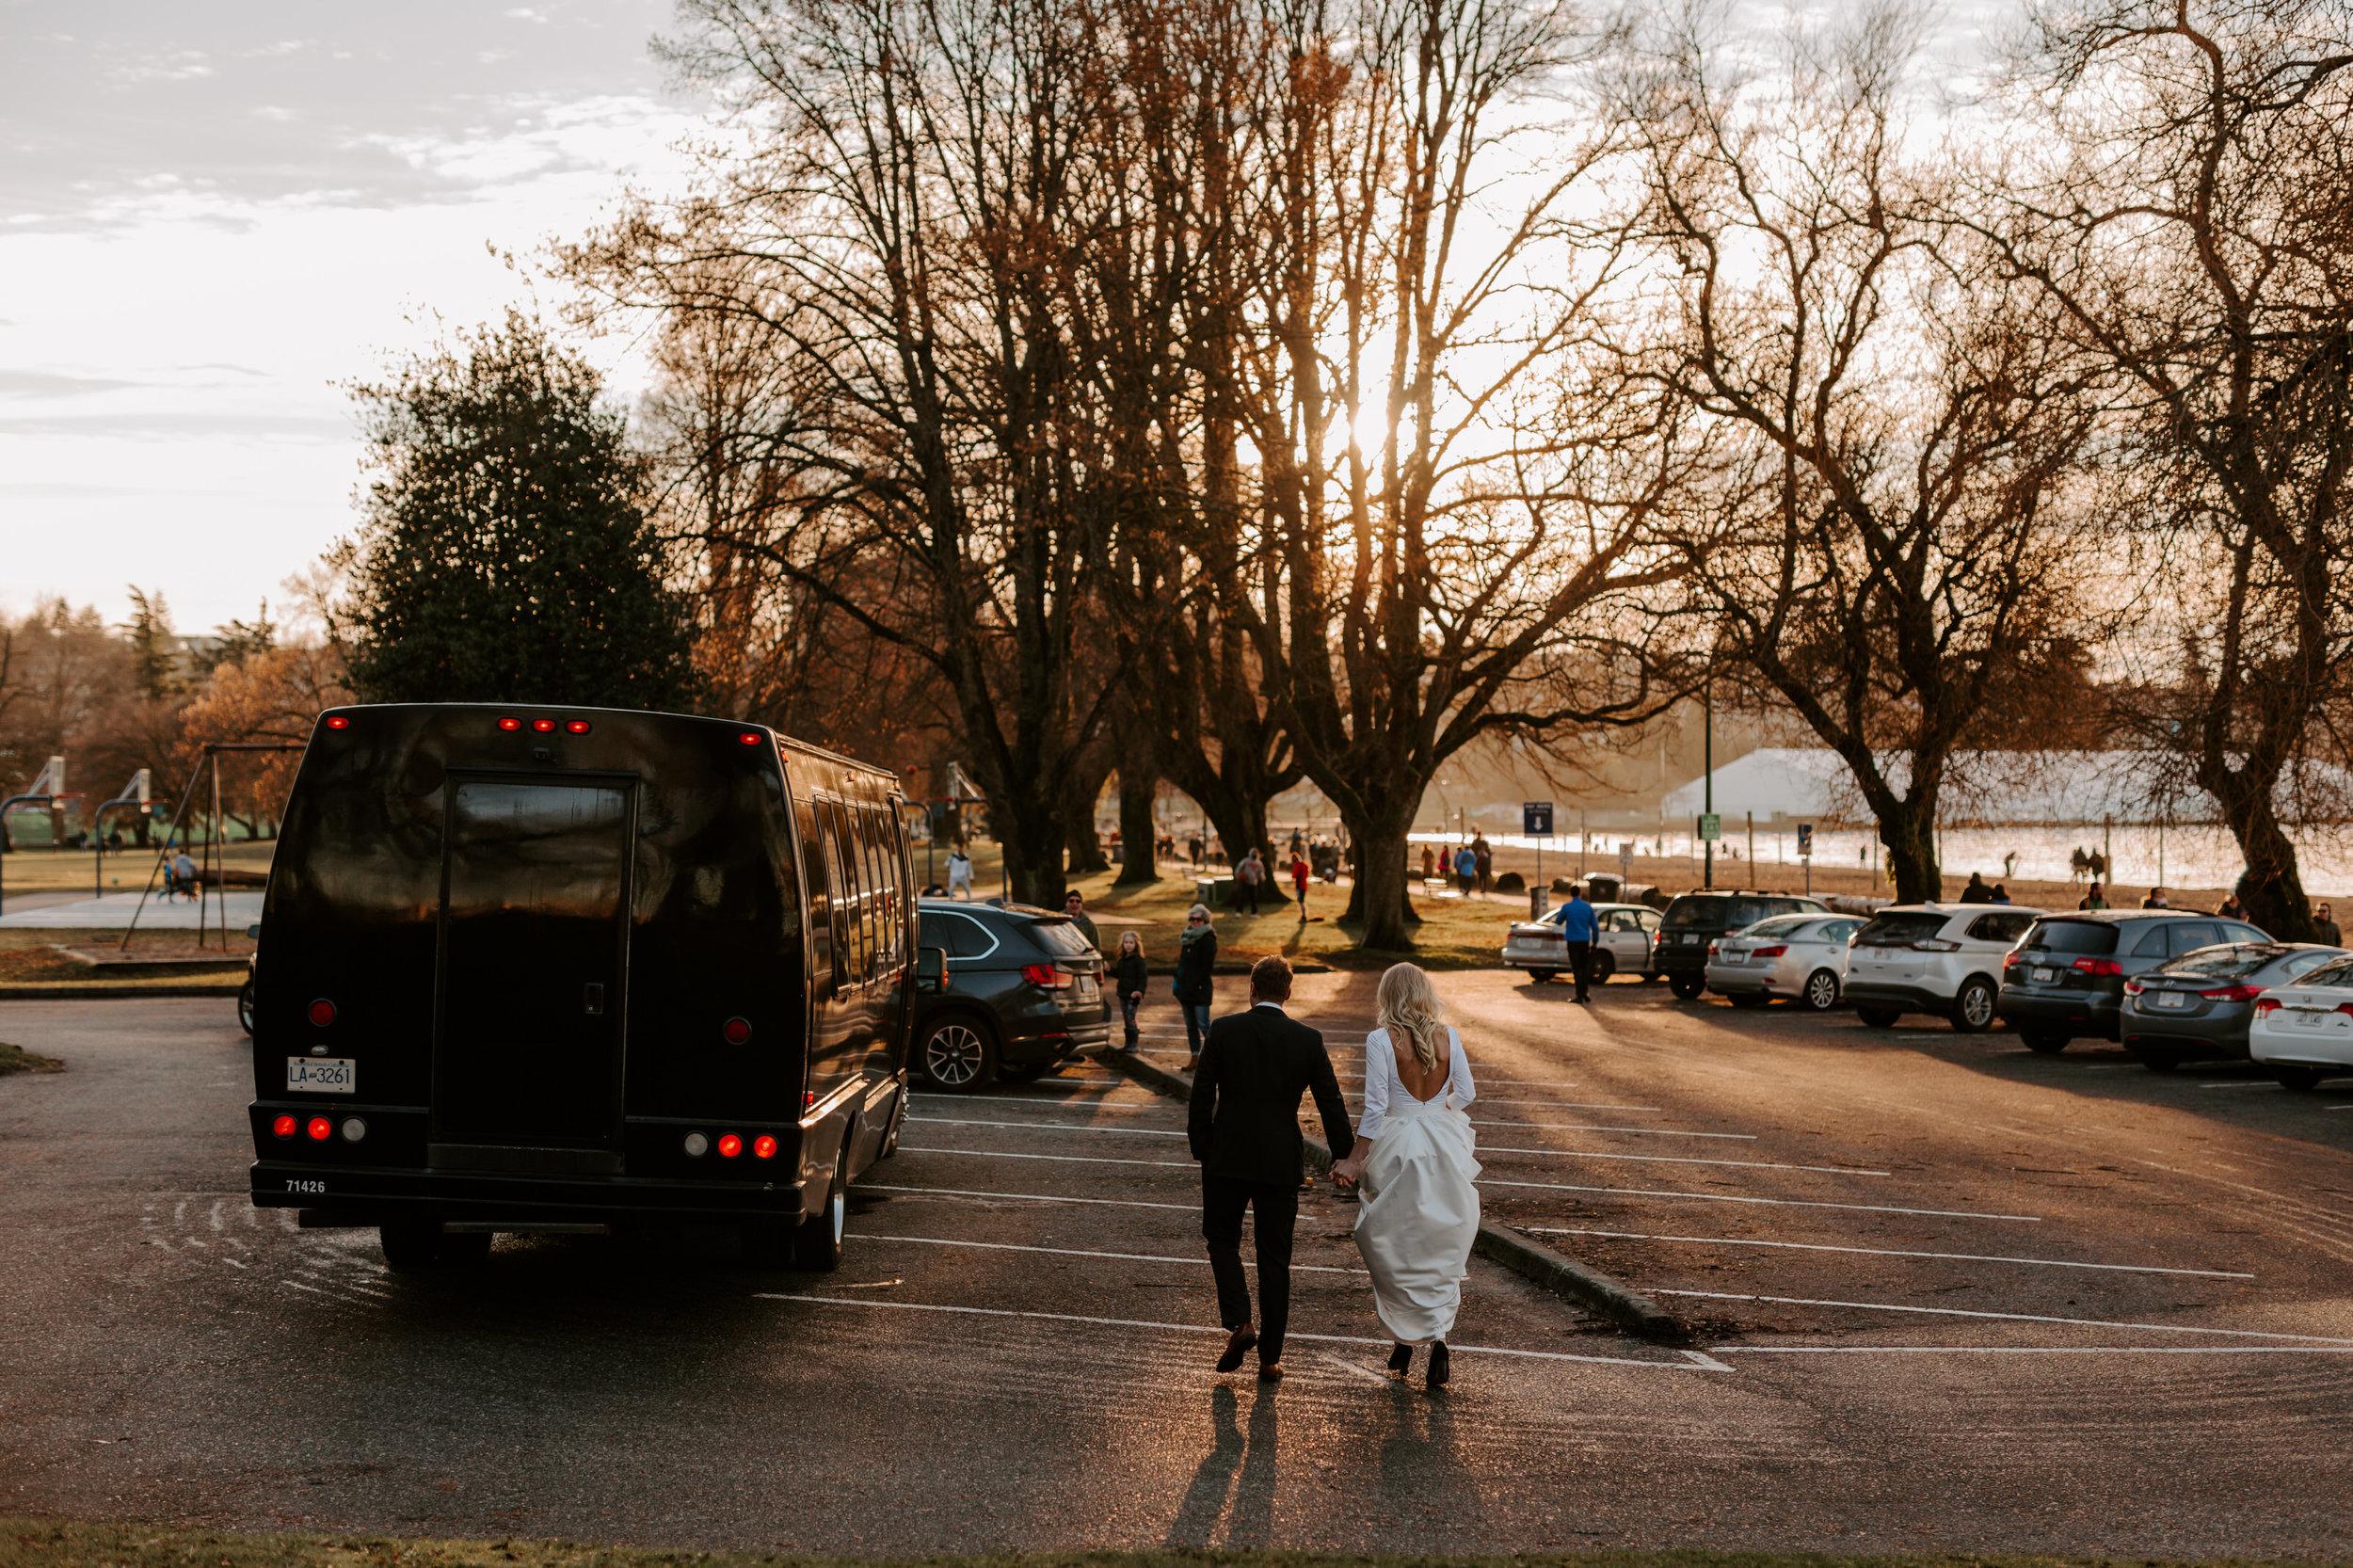 Vancouver Wedding Photos - Vegan Wedding Photographer - New Years Eve Wedding Photos - Vancouver Wedding Photographer - Vancouver Wedding Videographer - 726.JPG